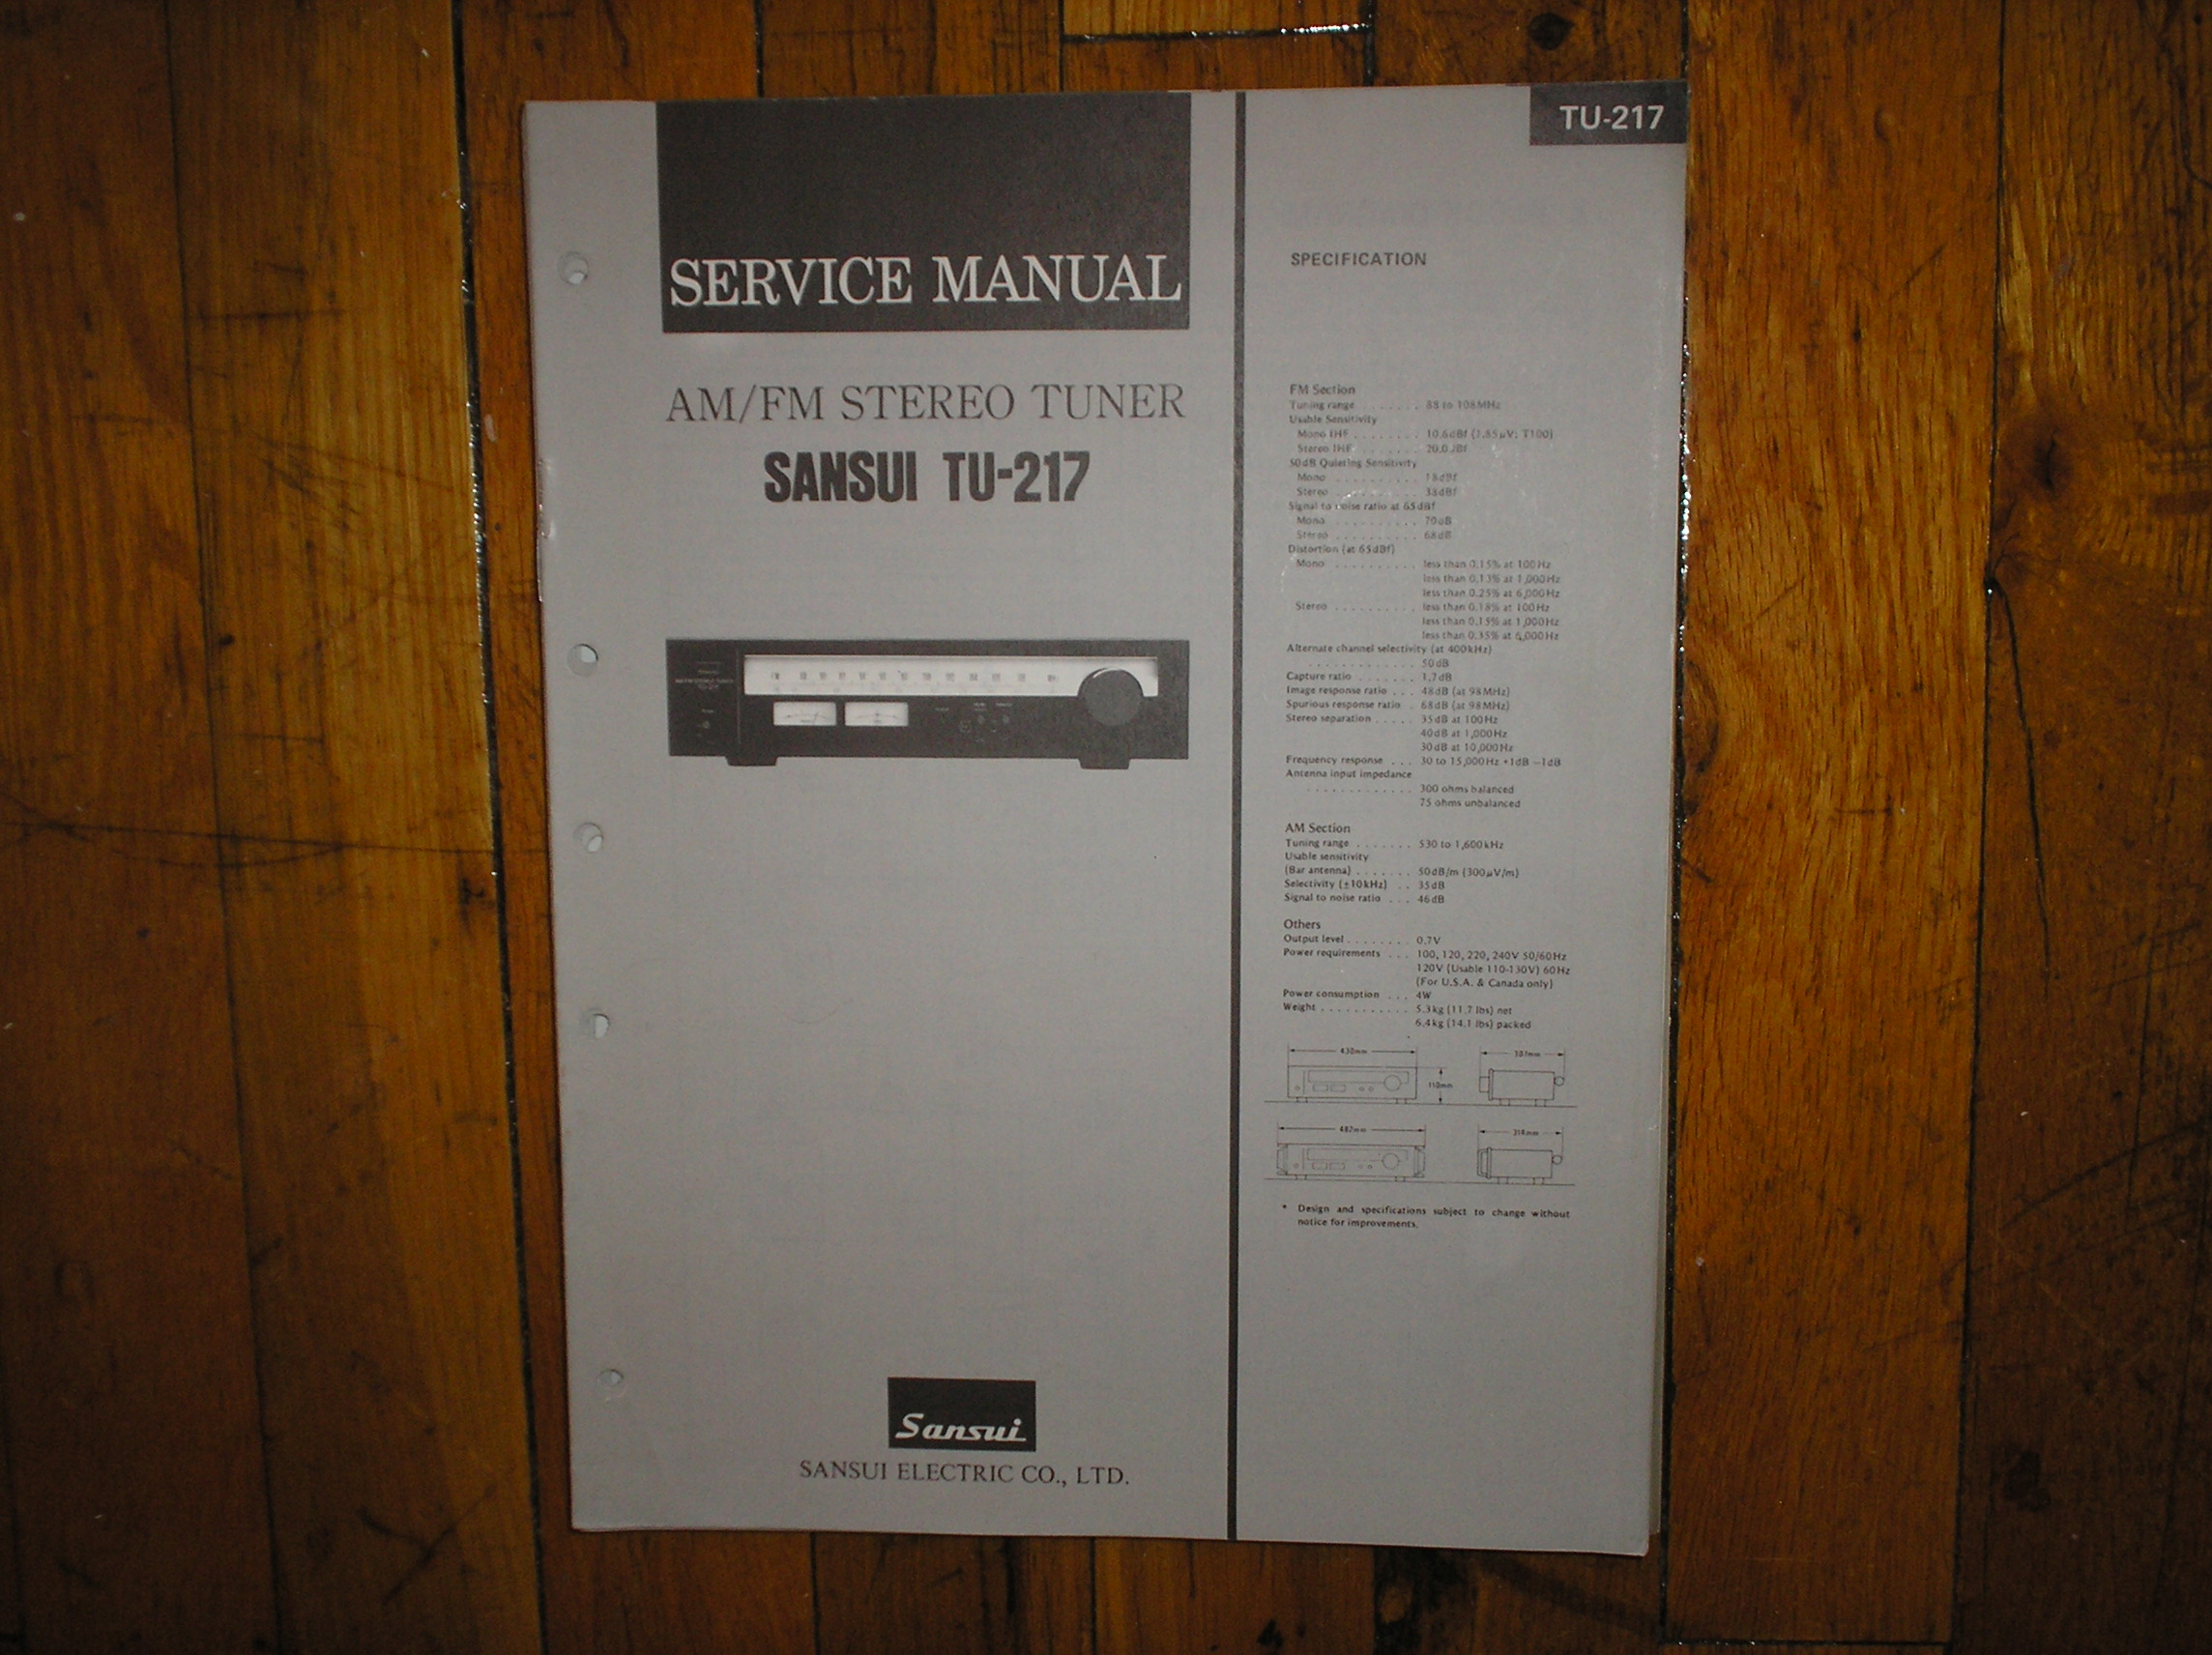 TU-217 Tuner Service Manual